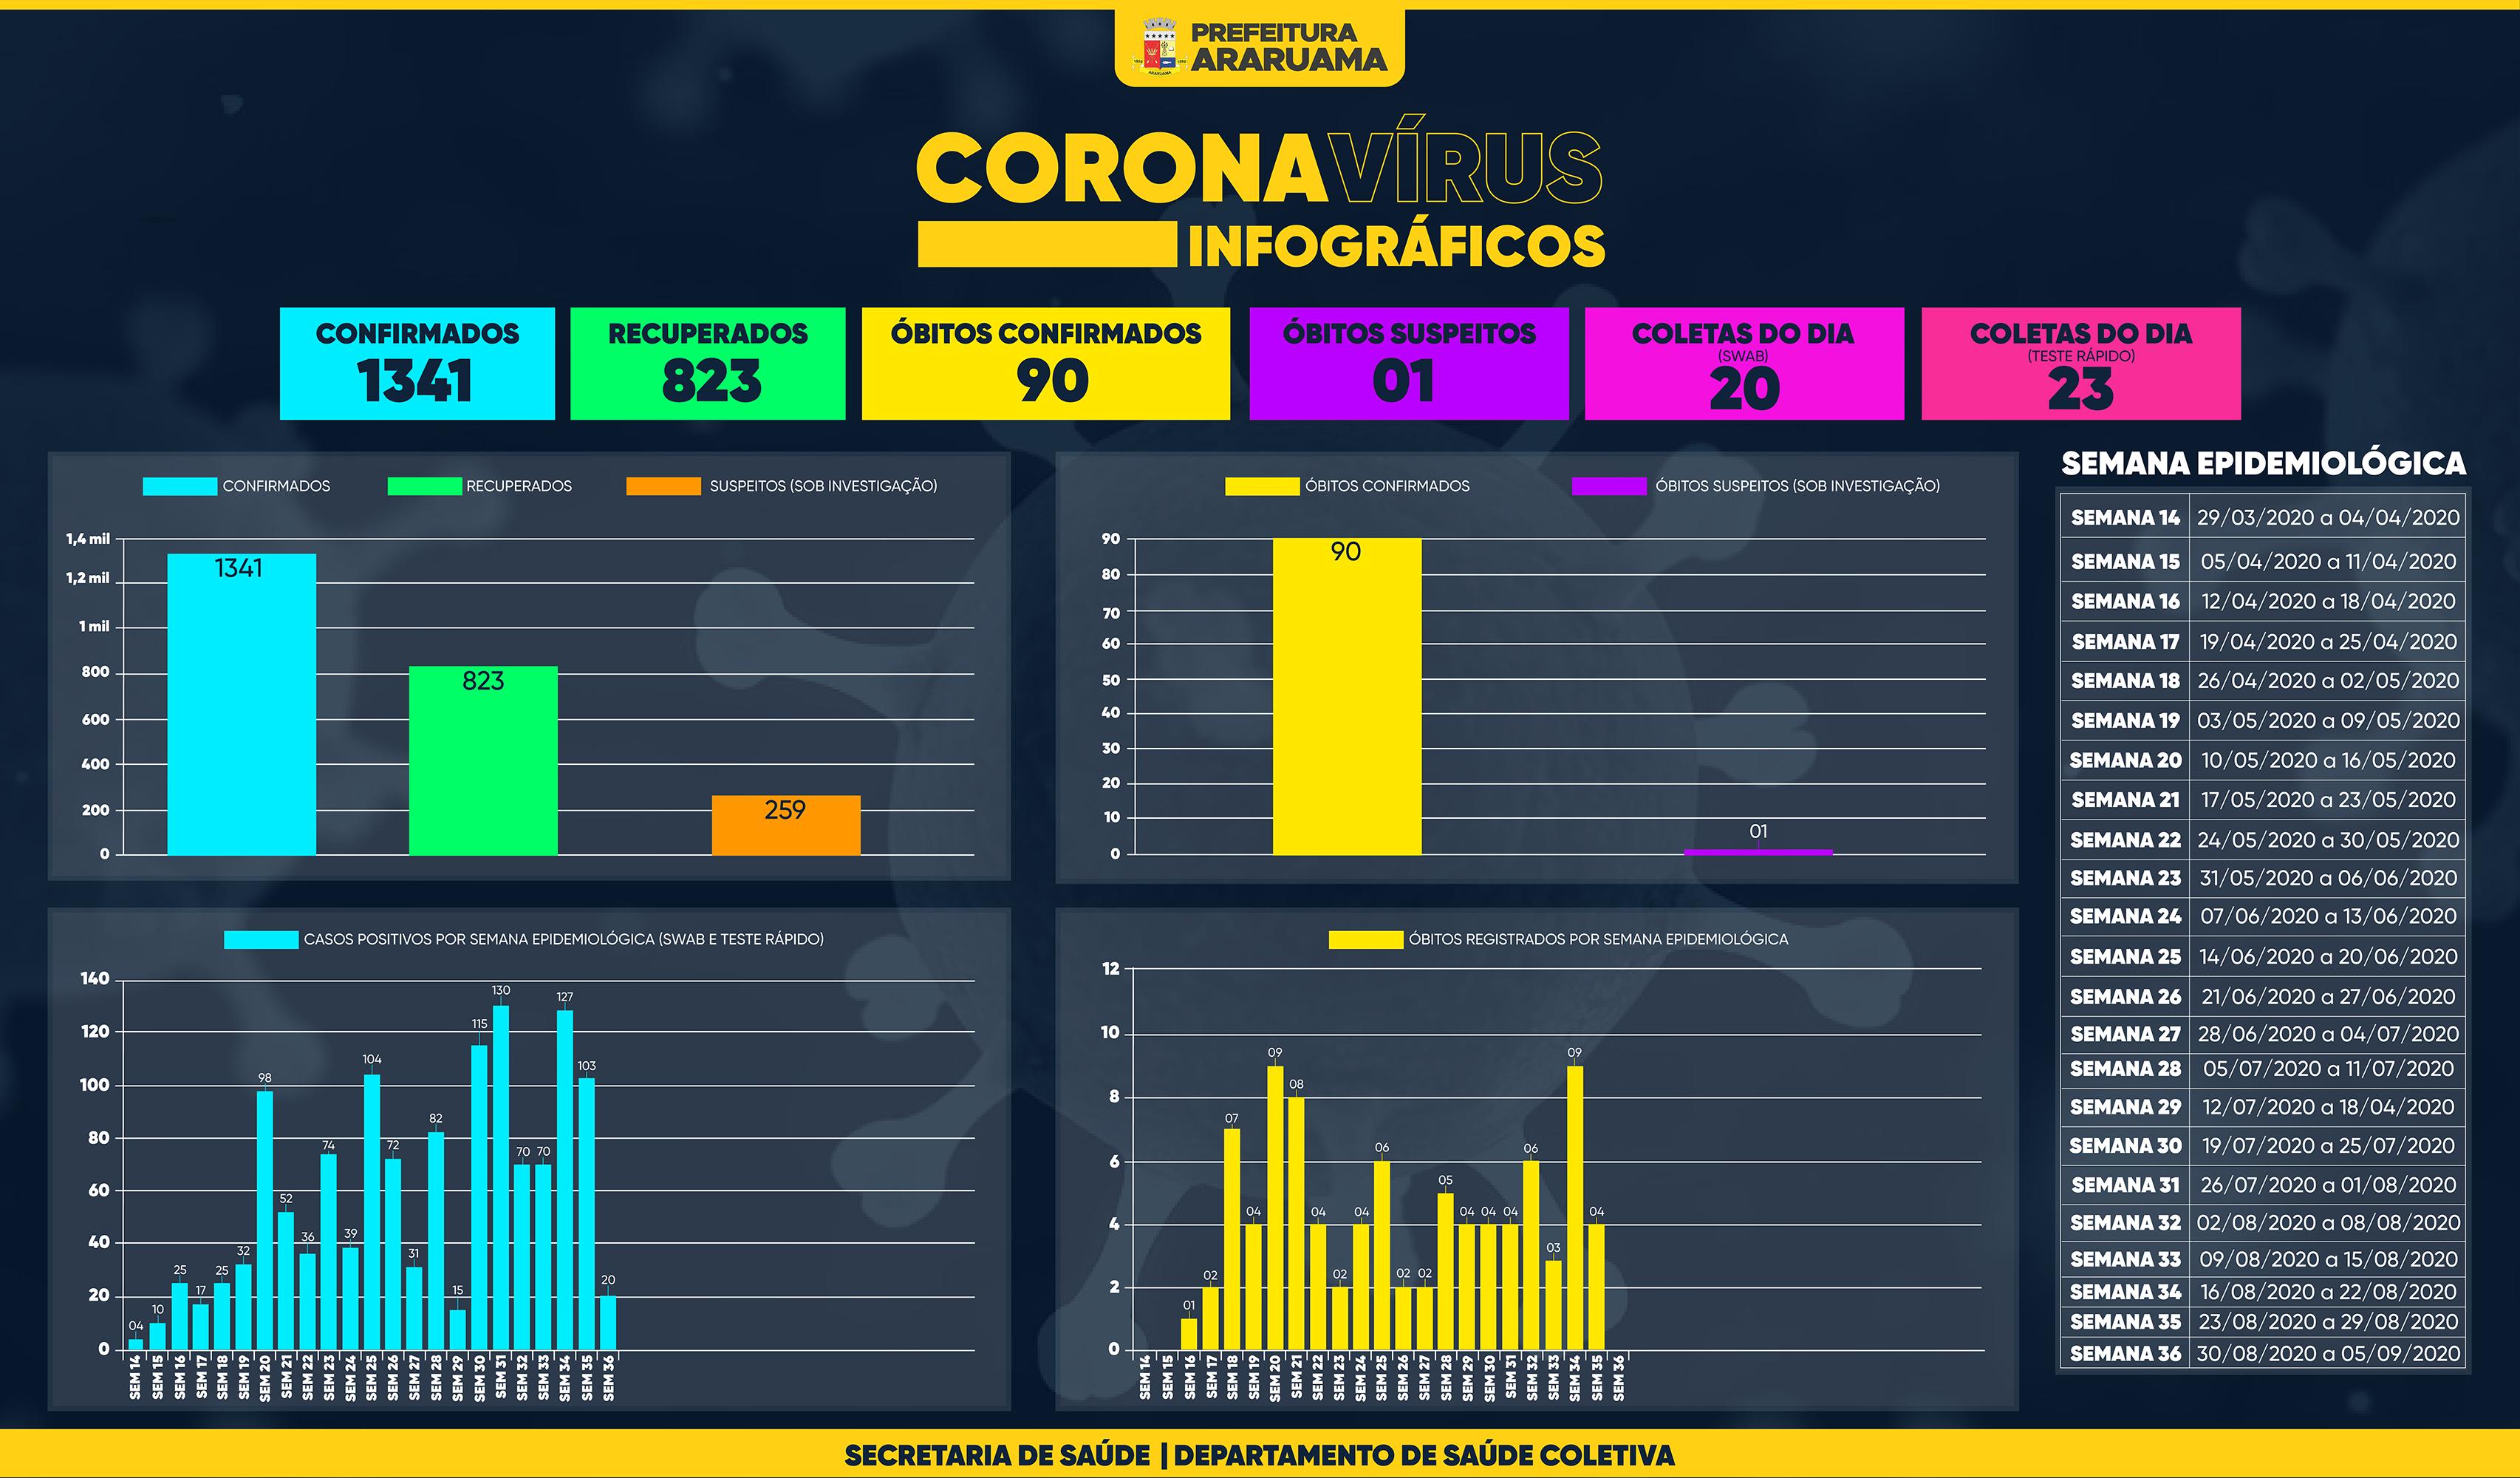 Painel de Monitoramento COVID-19 — Semana 36 — 02 de setembro de 2020